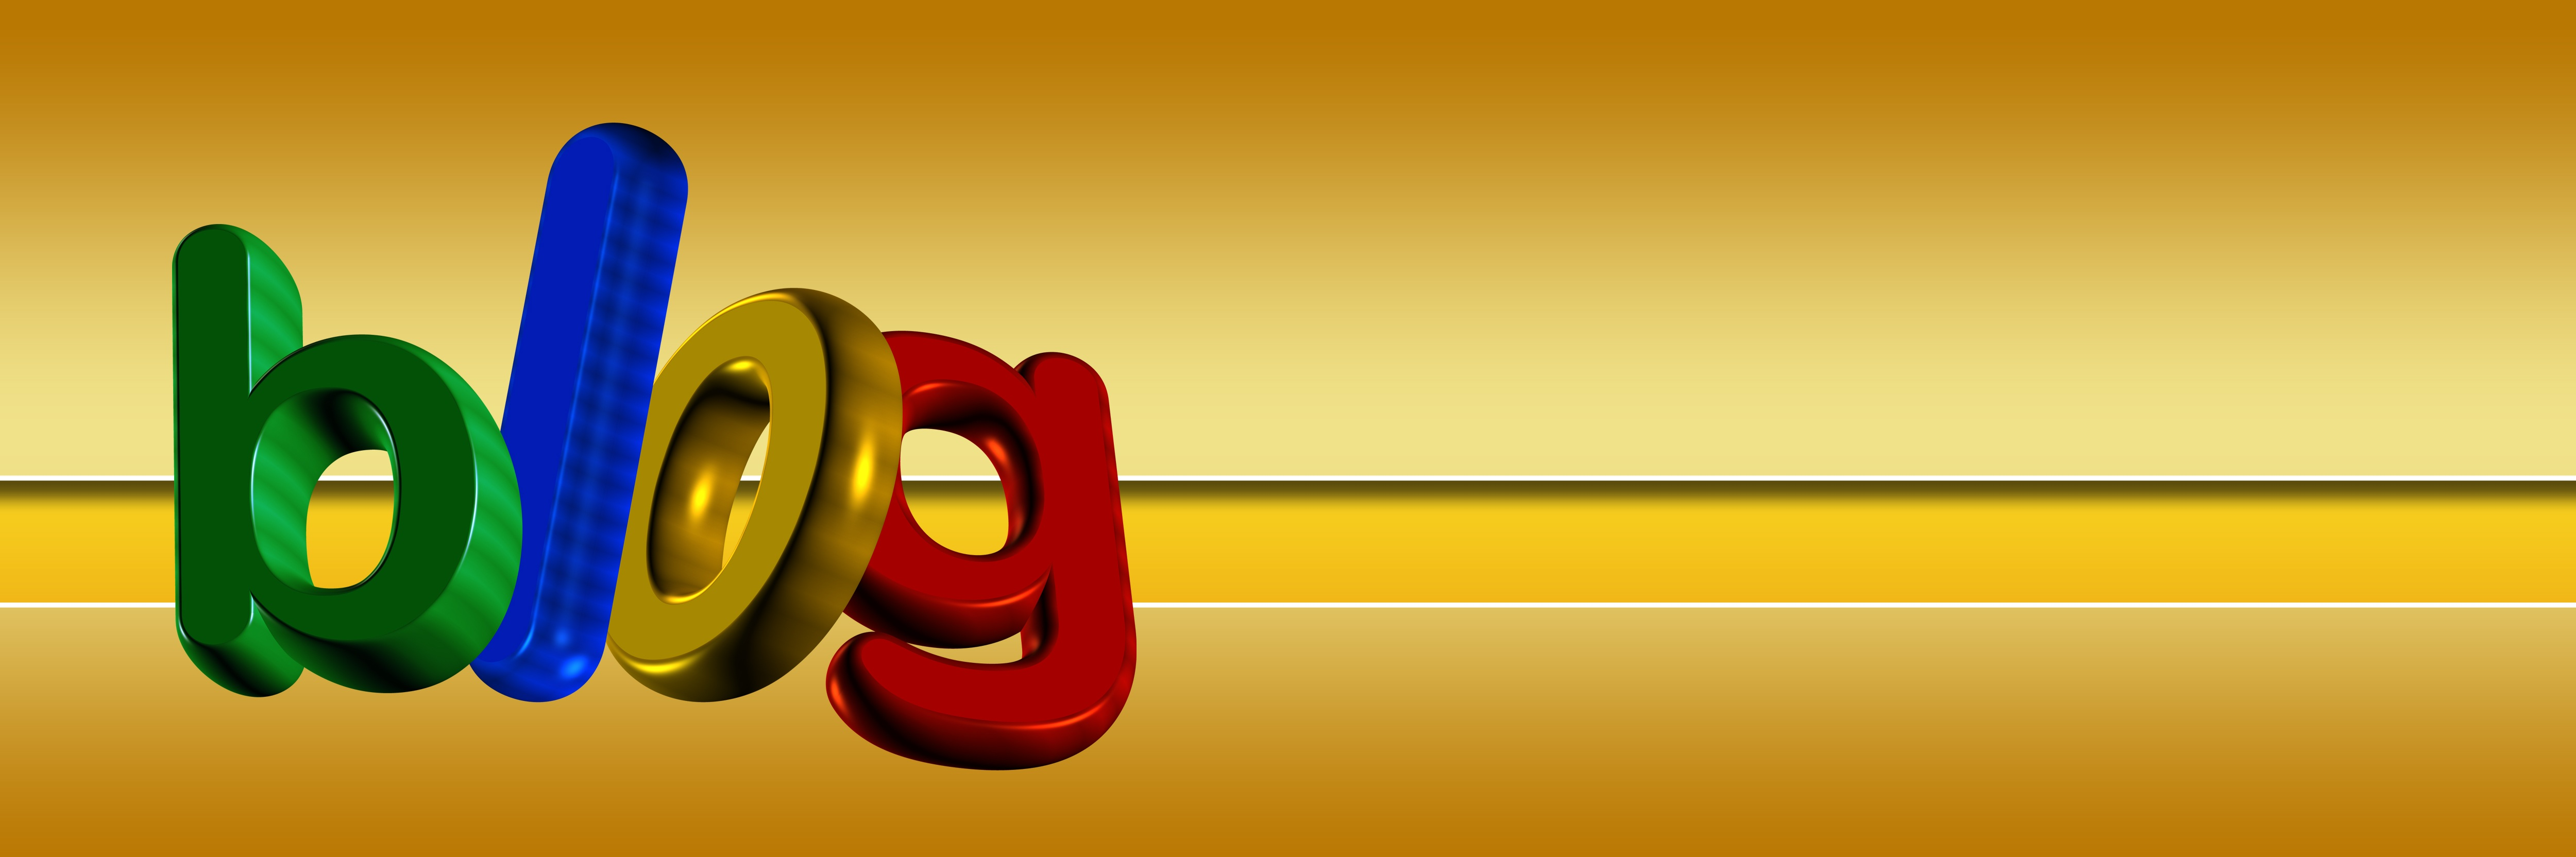 logo-13426901